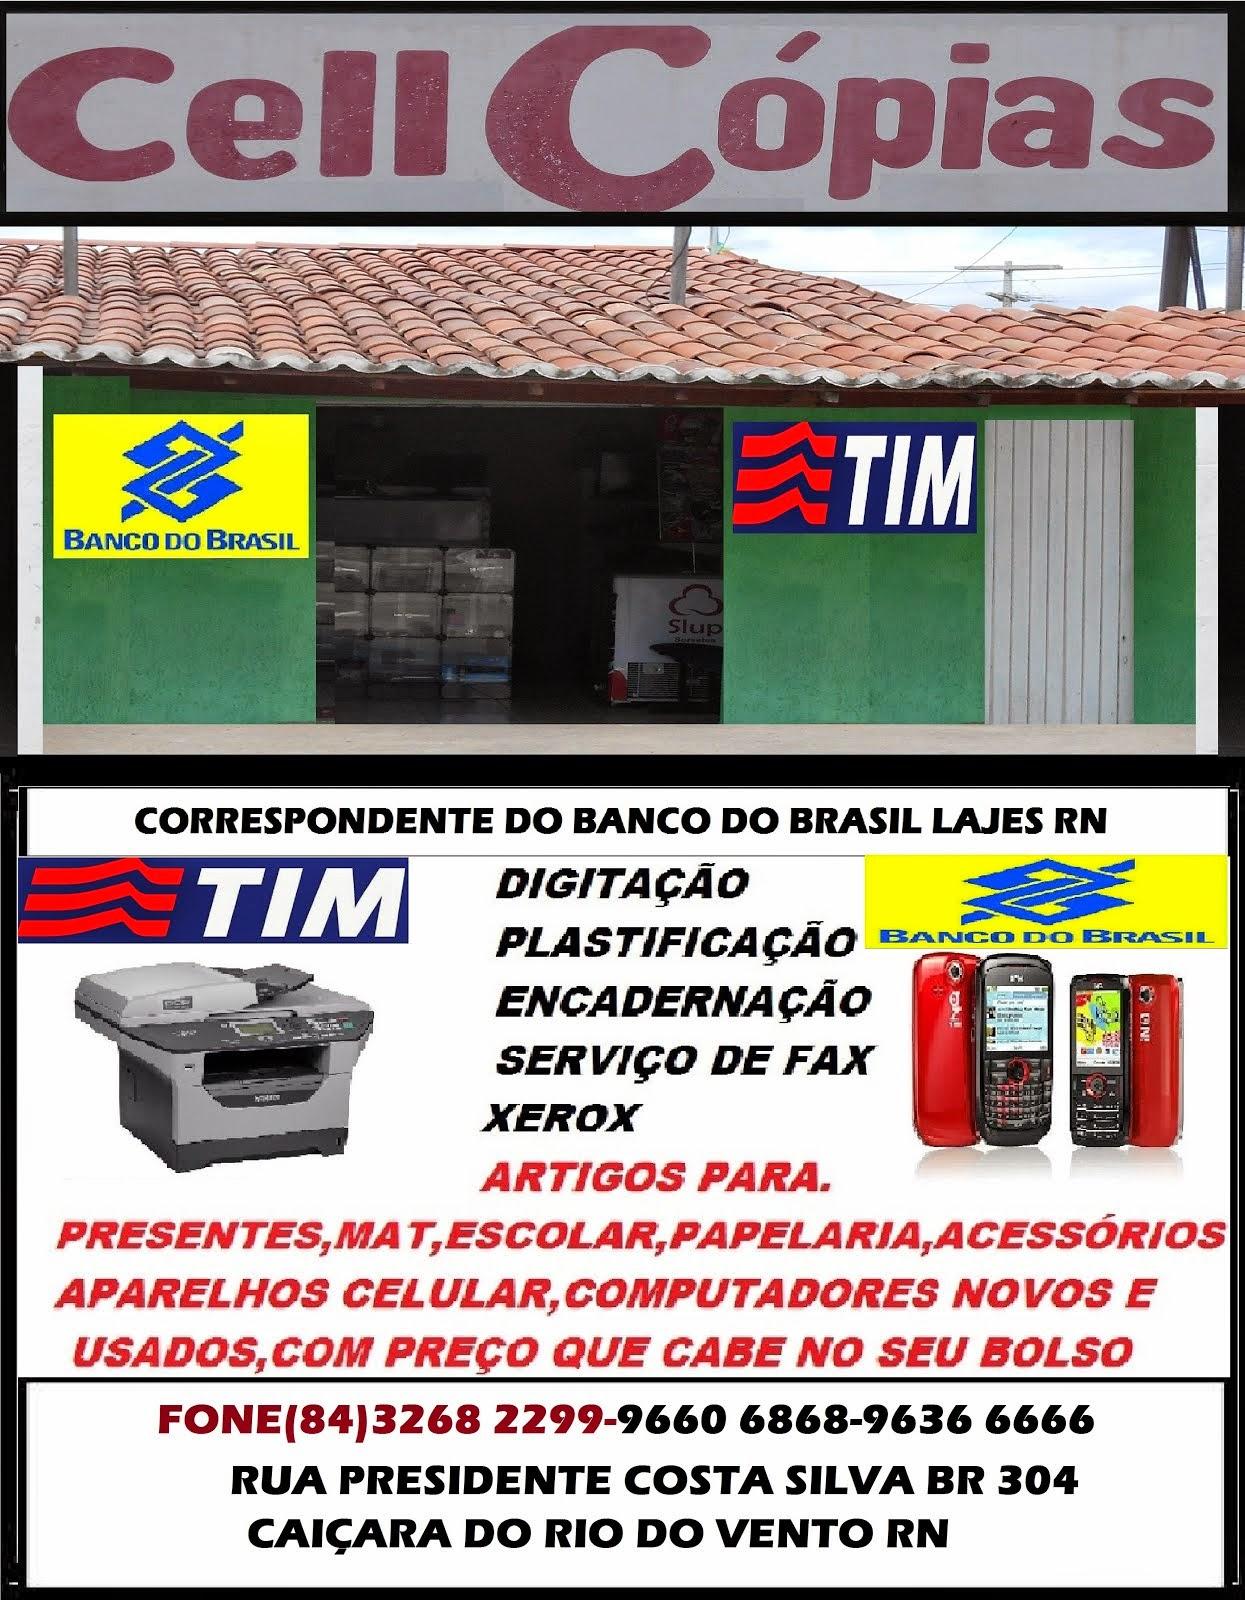 CELL CÓPIAS CAIÇARA DO RIO DO VENTO